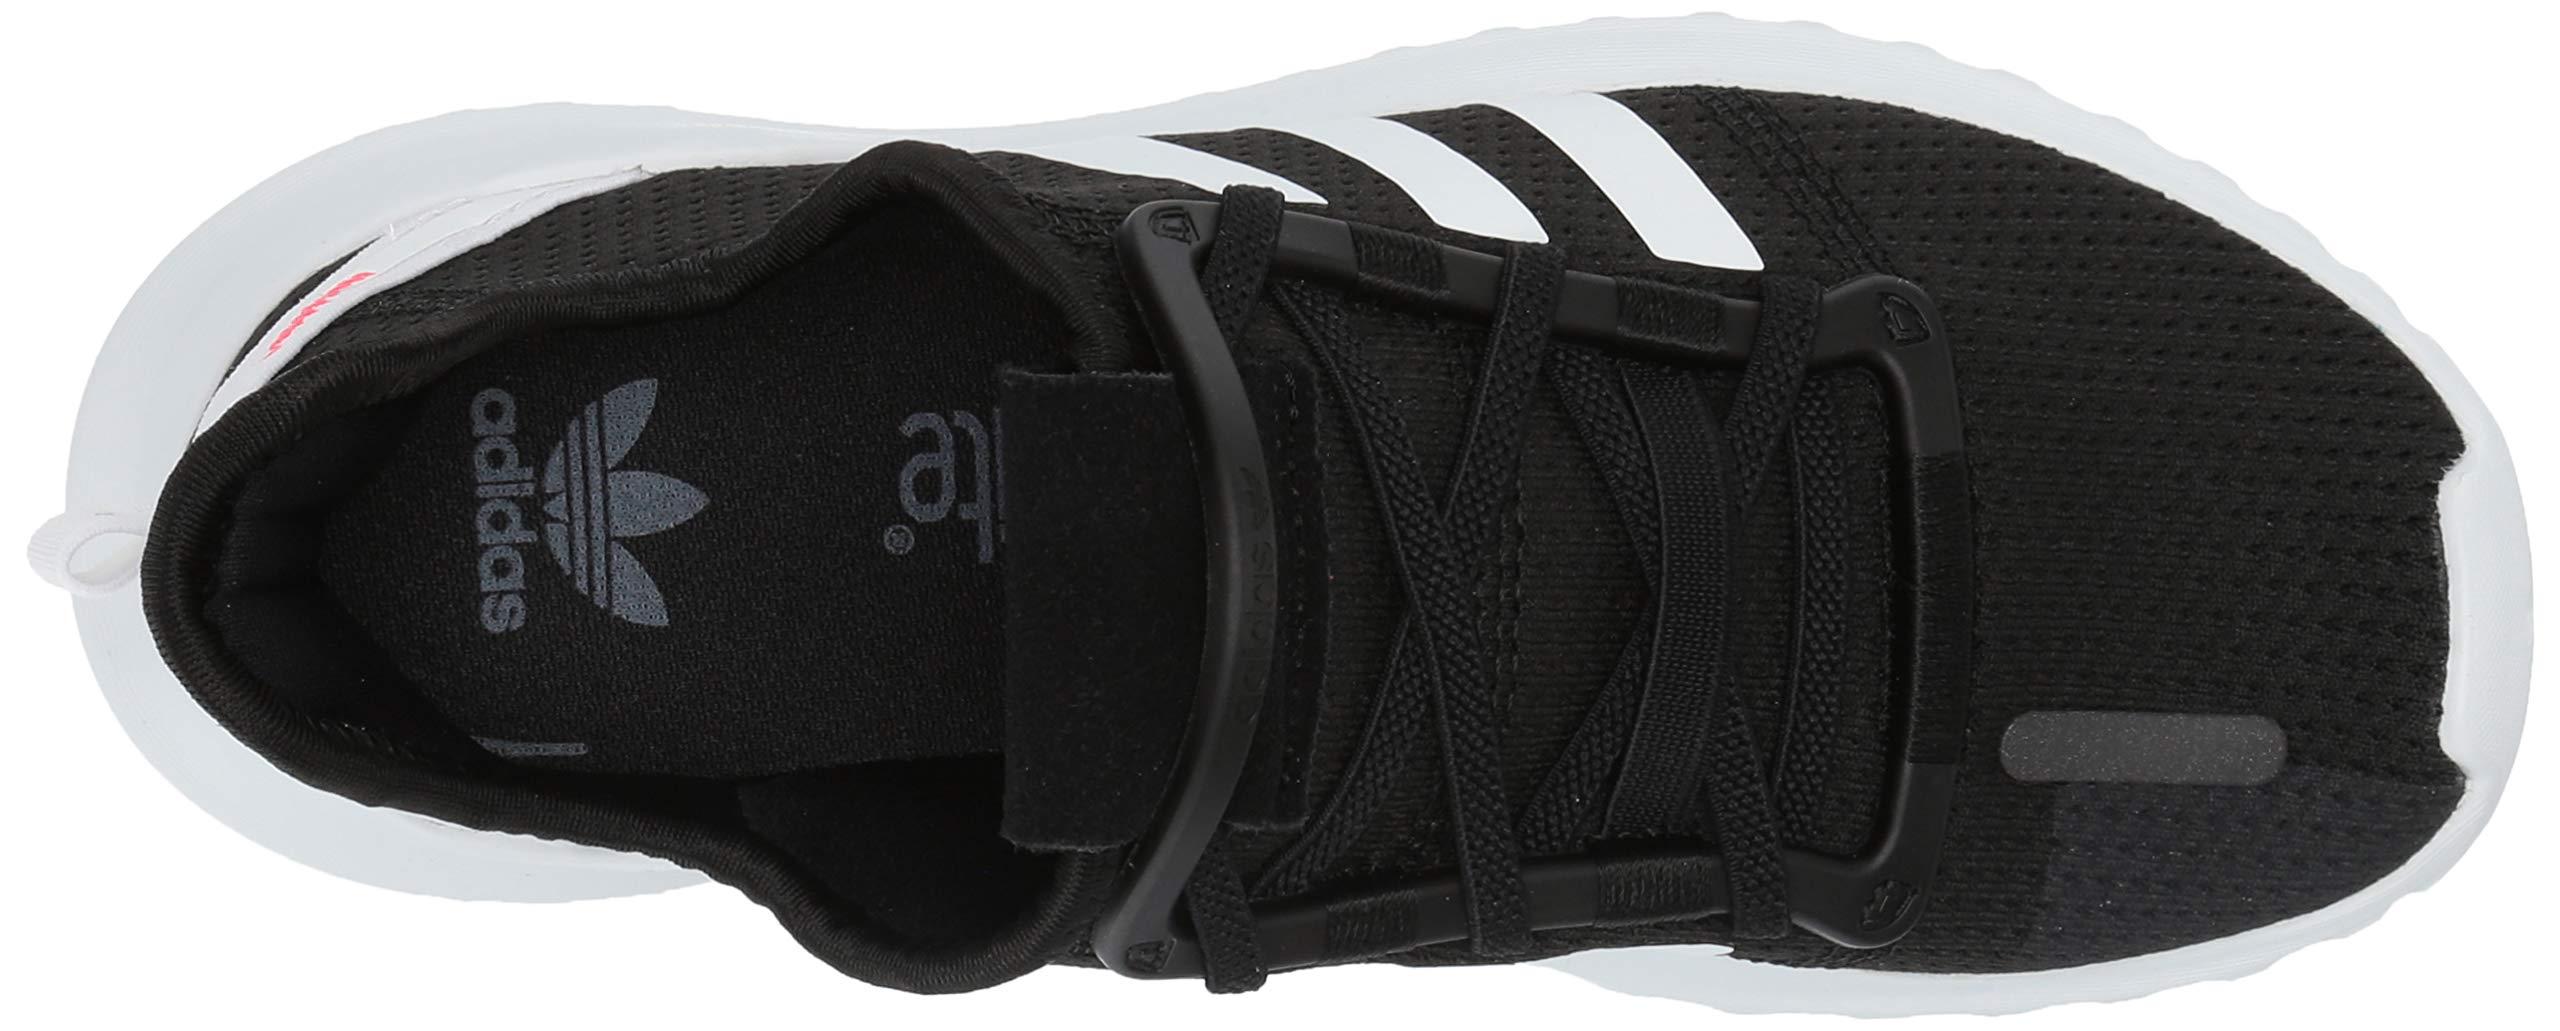 adidas Originals Baby U_Path Running Shoe Black/White/Shock red 6K M US Toddler by adidas Originals (Image #8)